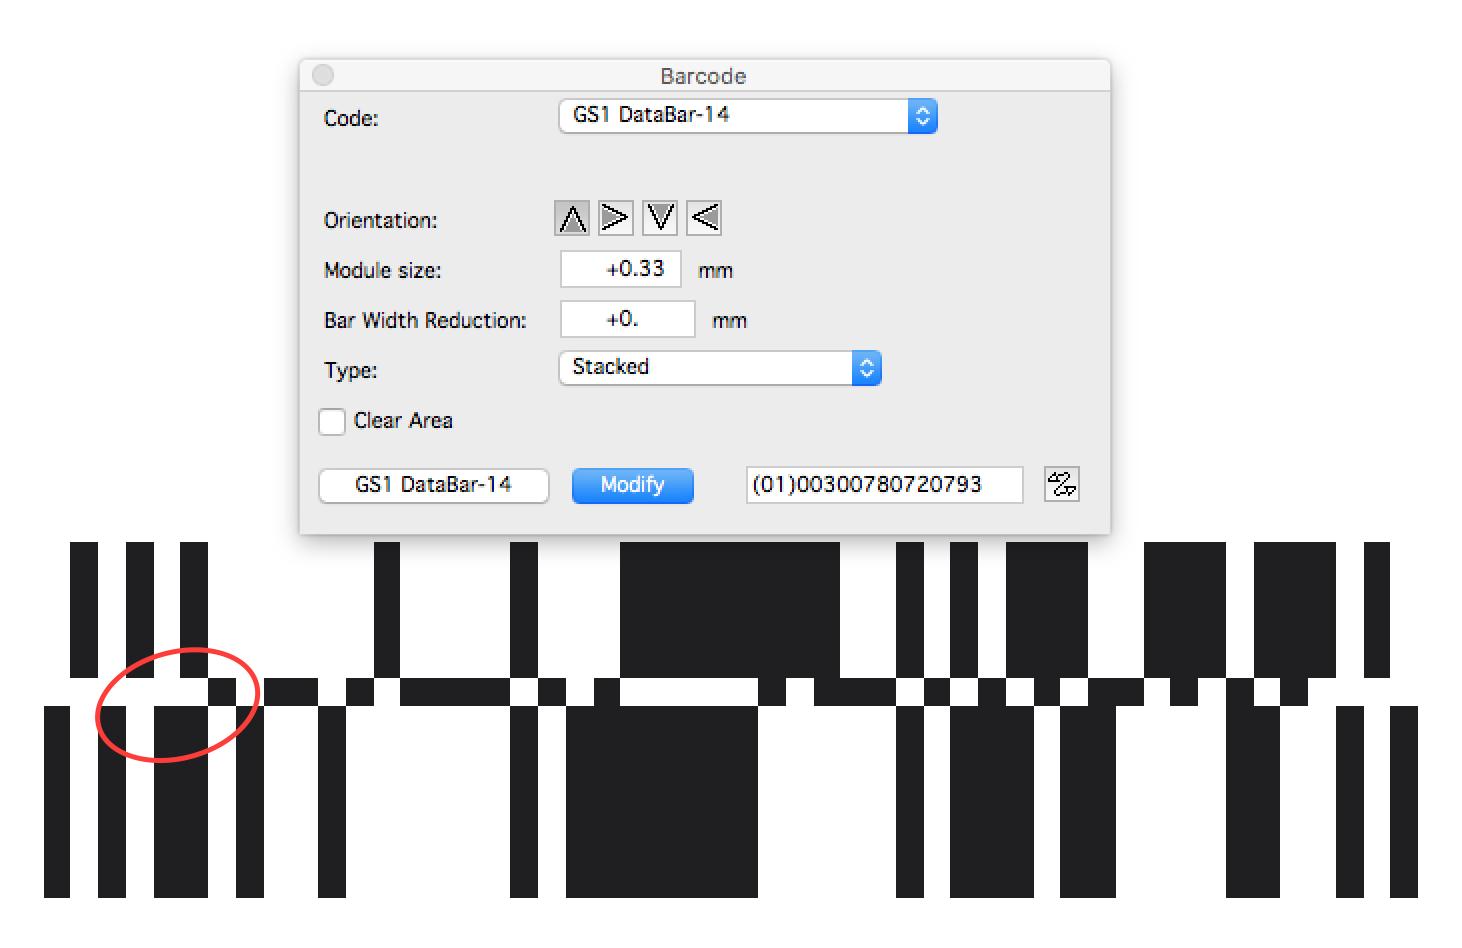 KB190841269: ArtPro - GS1 Databar-14 stacked barcode change